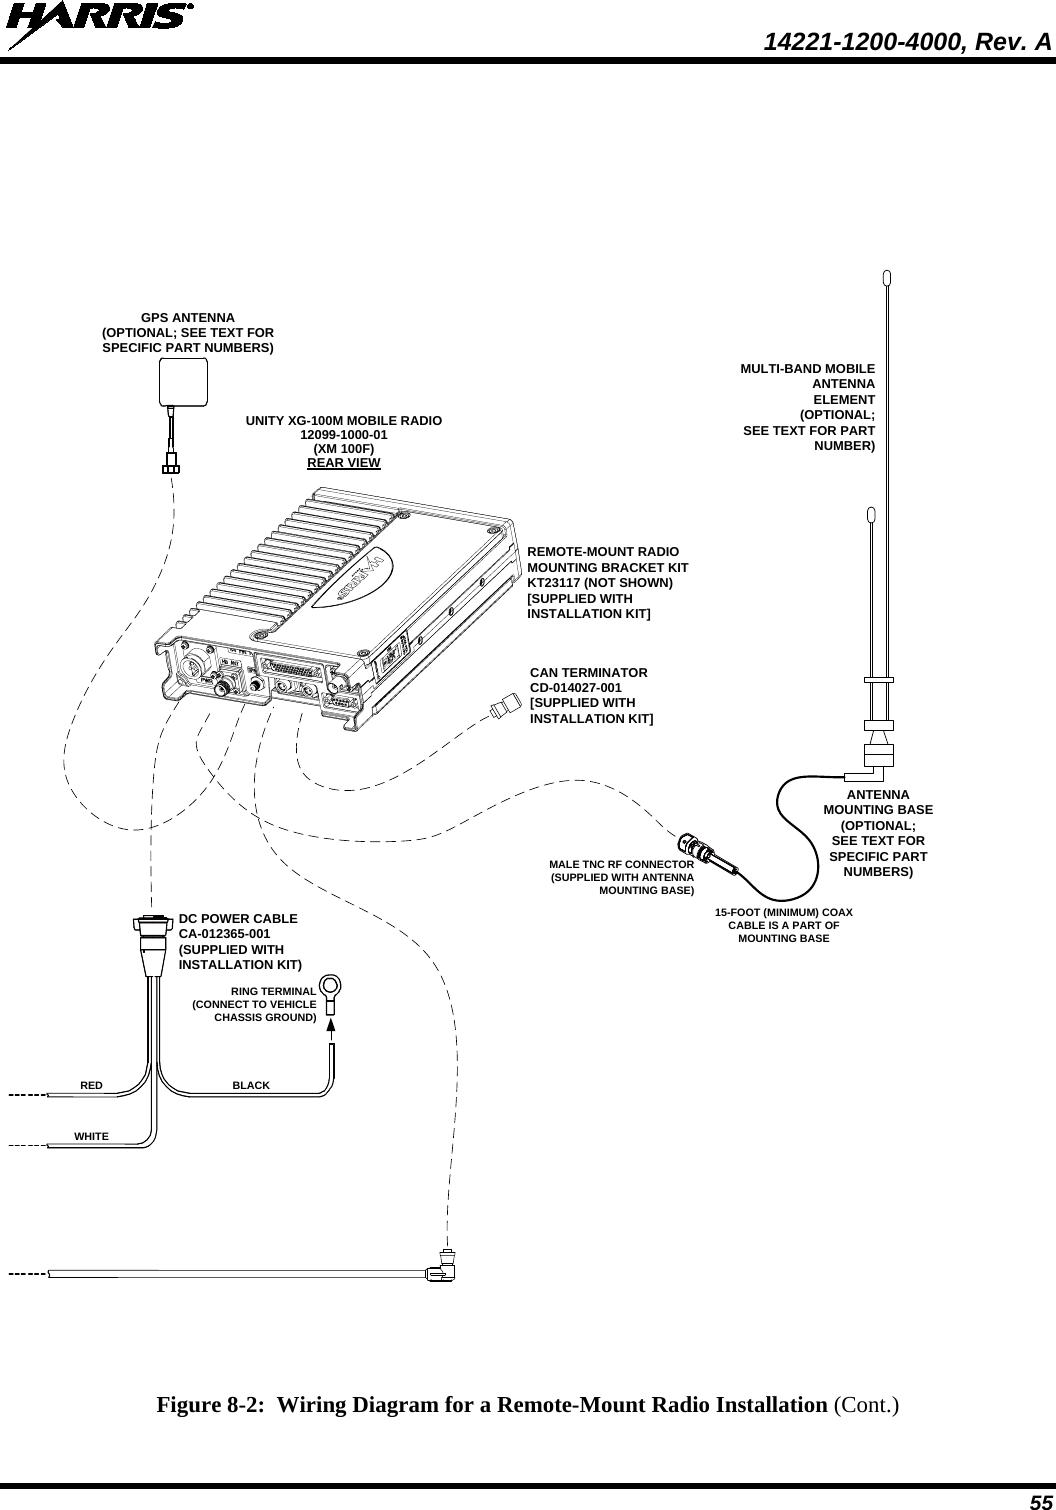 Harris RF Communications Division XG-100M00 Unity